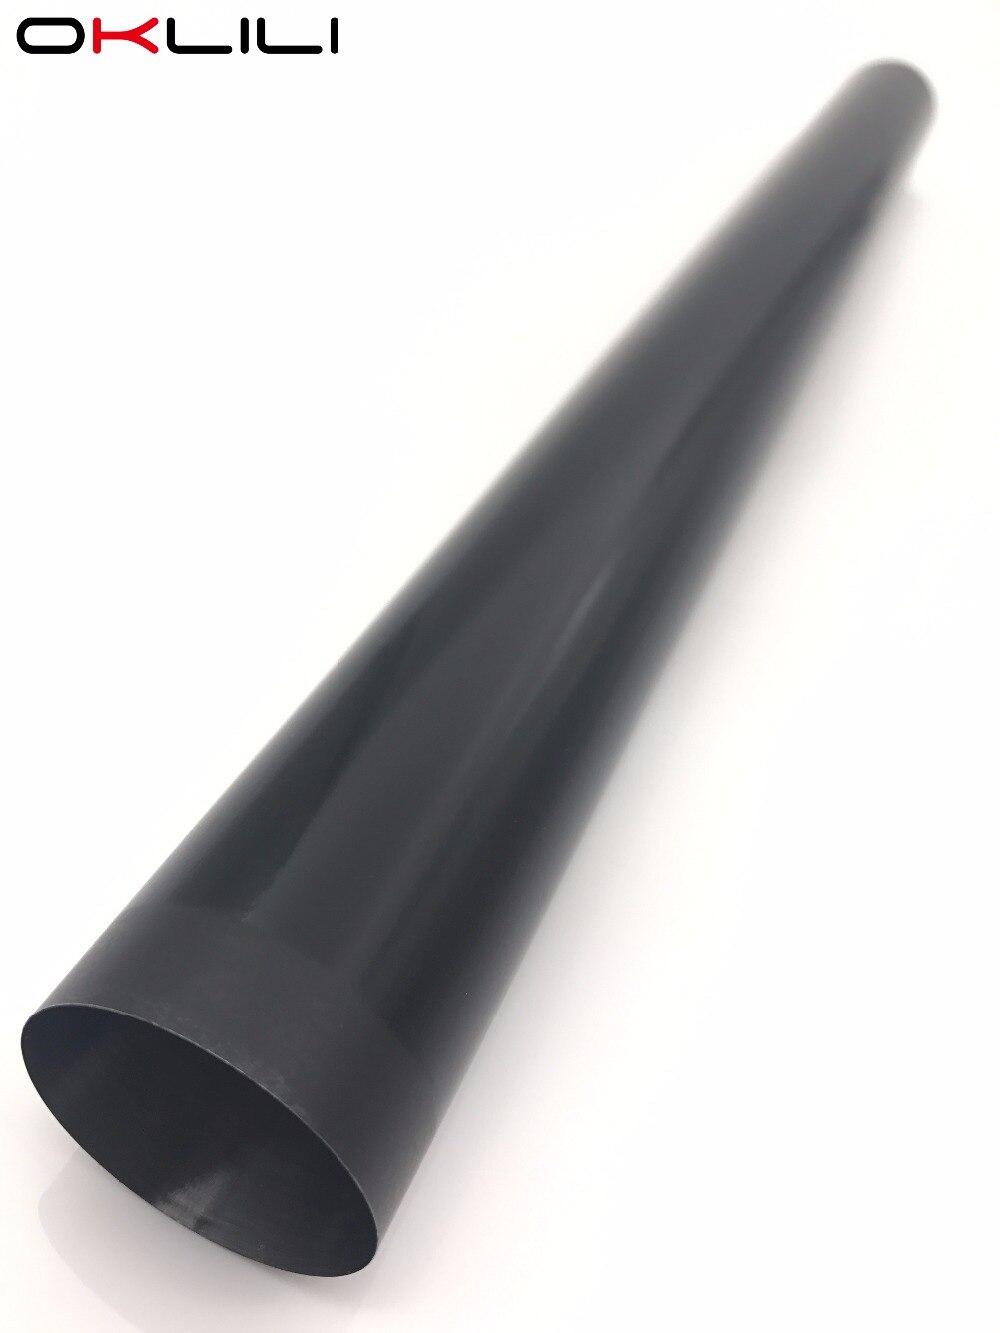 5PCX Fuser Fixing Film Sleeve for Canon IR2535 IR2545 IR ADVANCE 4025 4035 4045 4051 4225 4235 4245 4251 4525 4535 4545 4551 2x 220v ir4025 ir4035 ir4045 ir4051 ir4225 ir4235 ceramic heating element compatible for canon ir advance 4025 4035 4045 4051